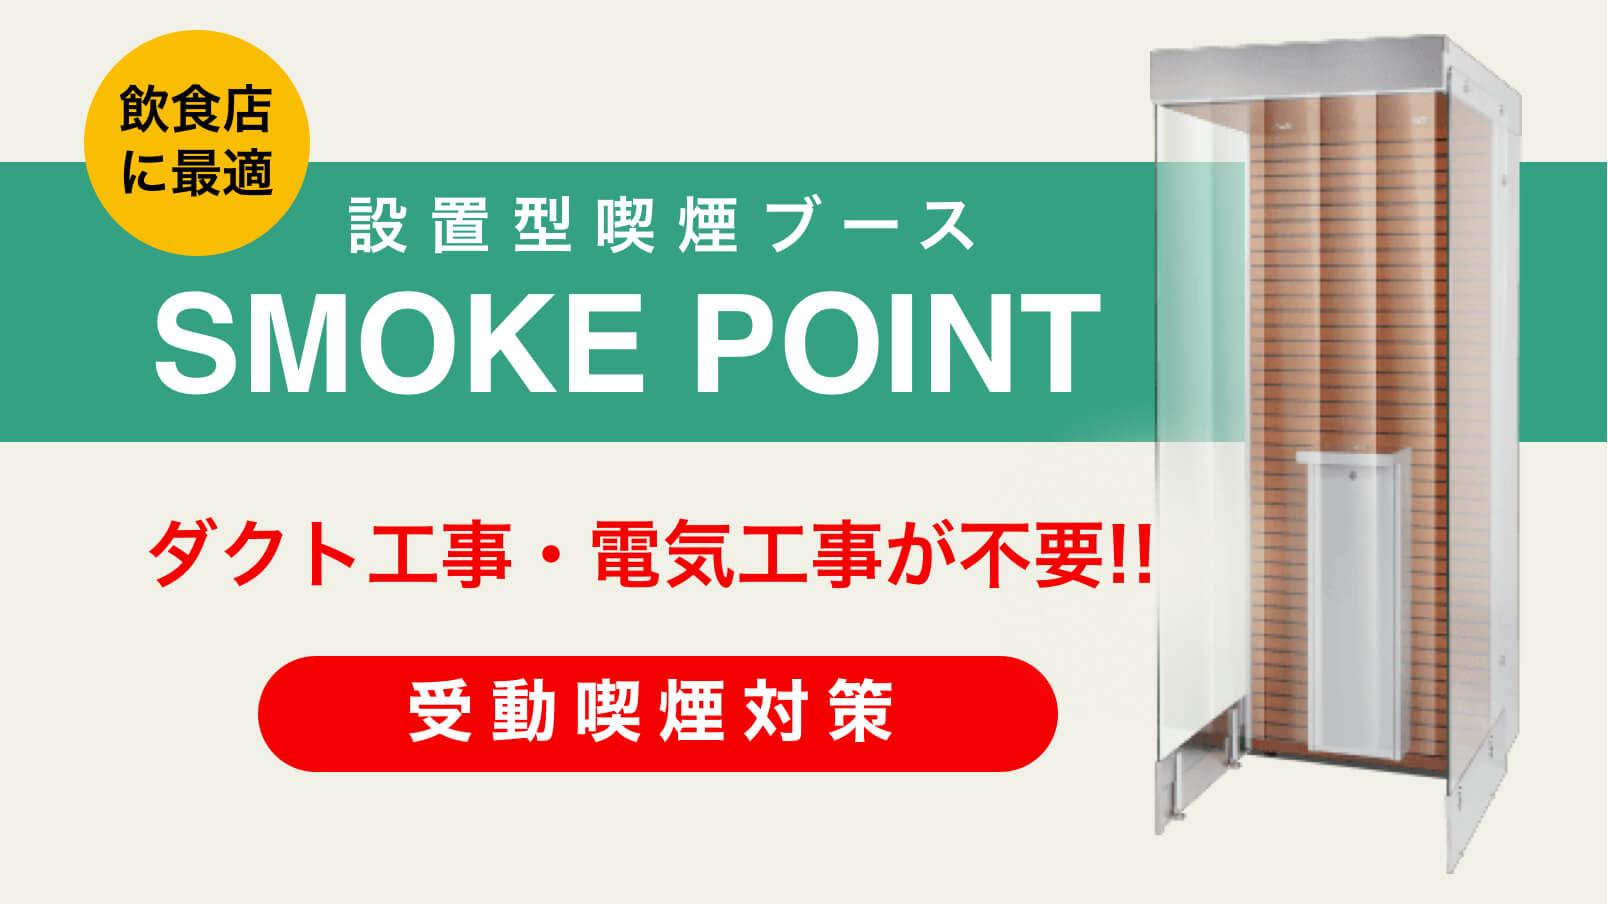 SMOKE POINT